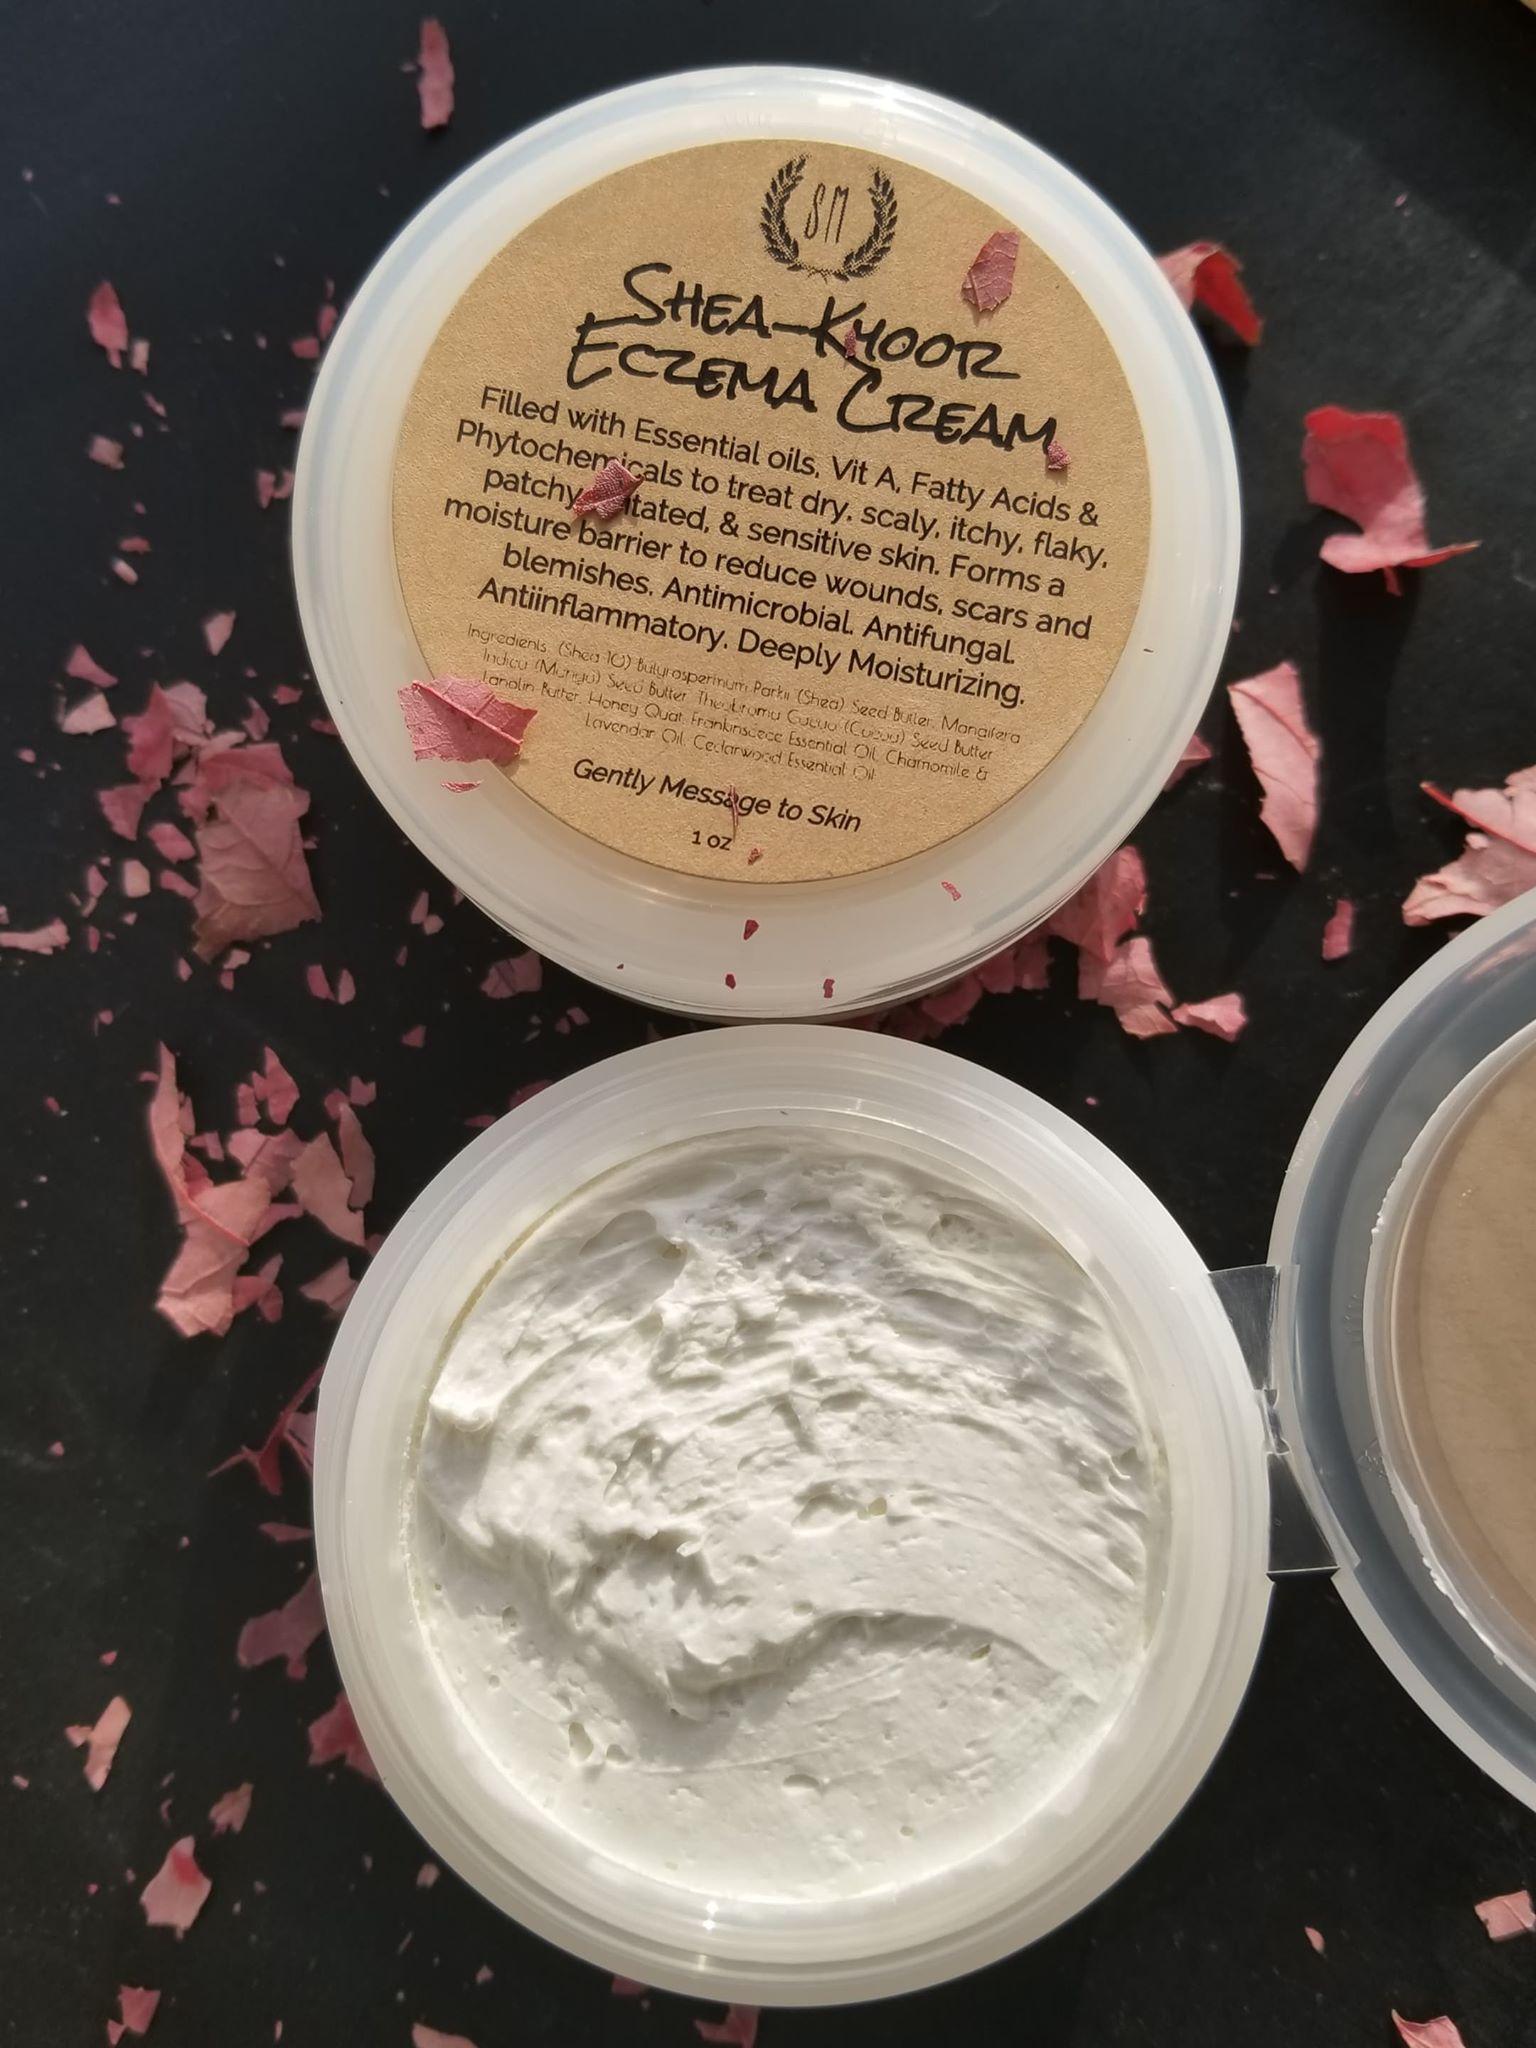 Lanolin cream for eczema